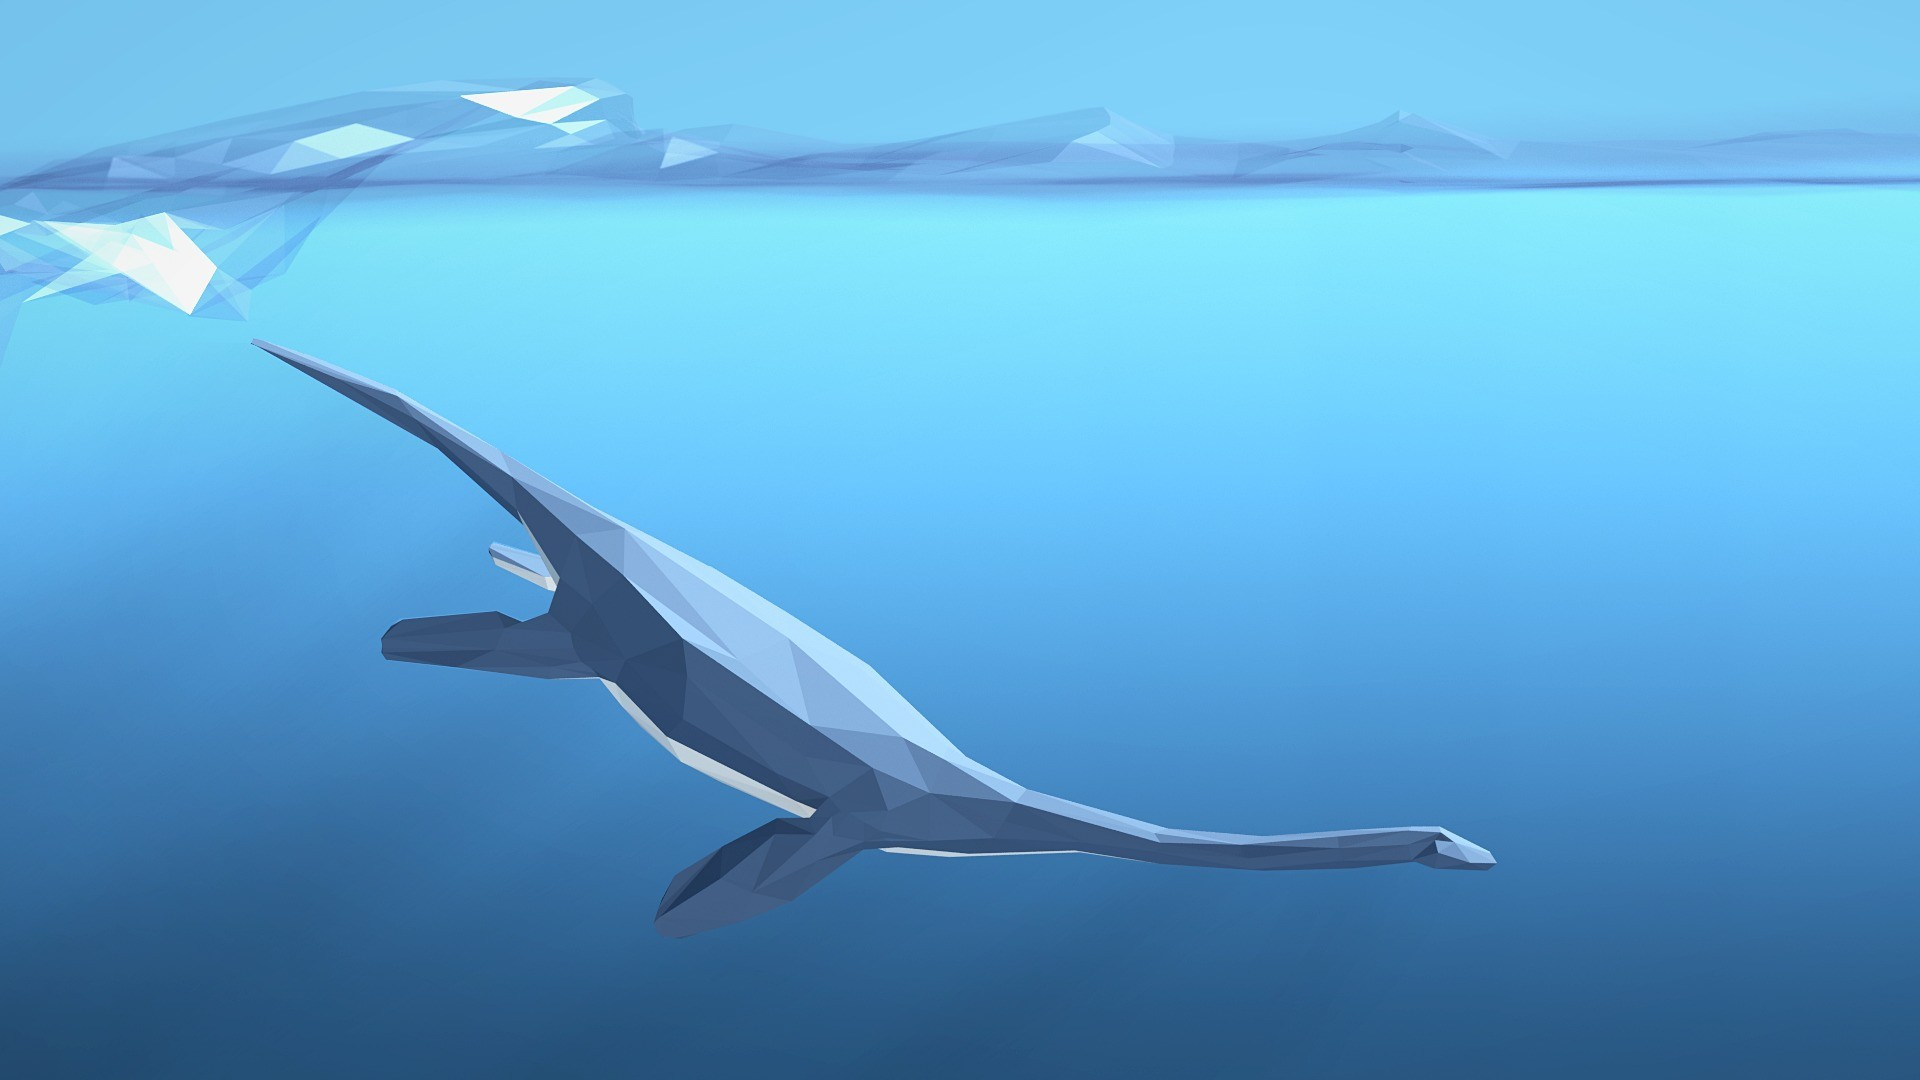 General 1920x1080 minimalism digital art low poly animals dinosaurs blue waves underwater swimming artwork